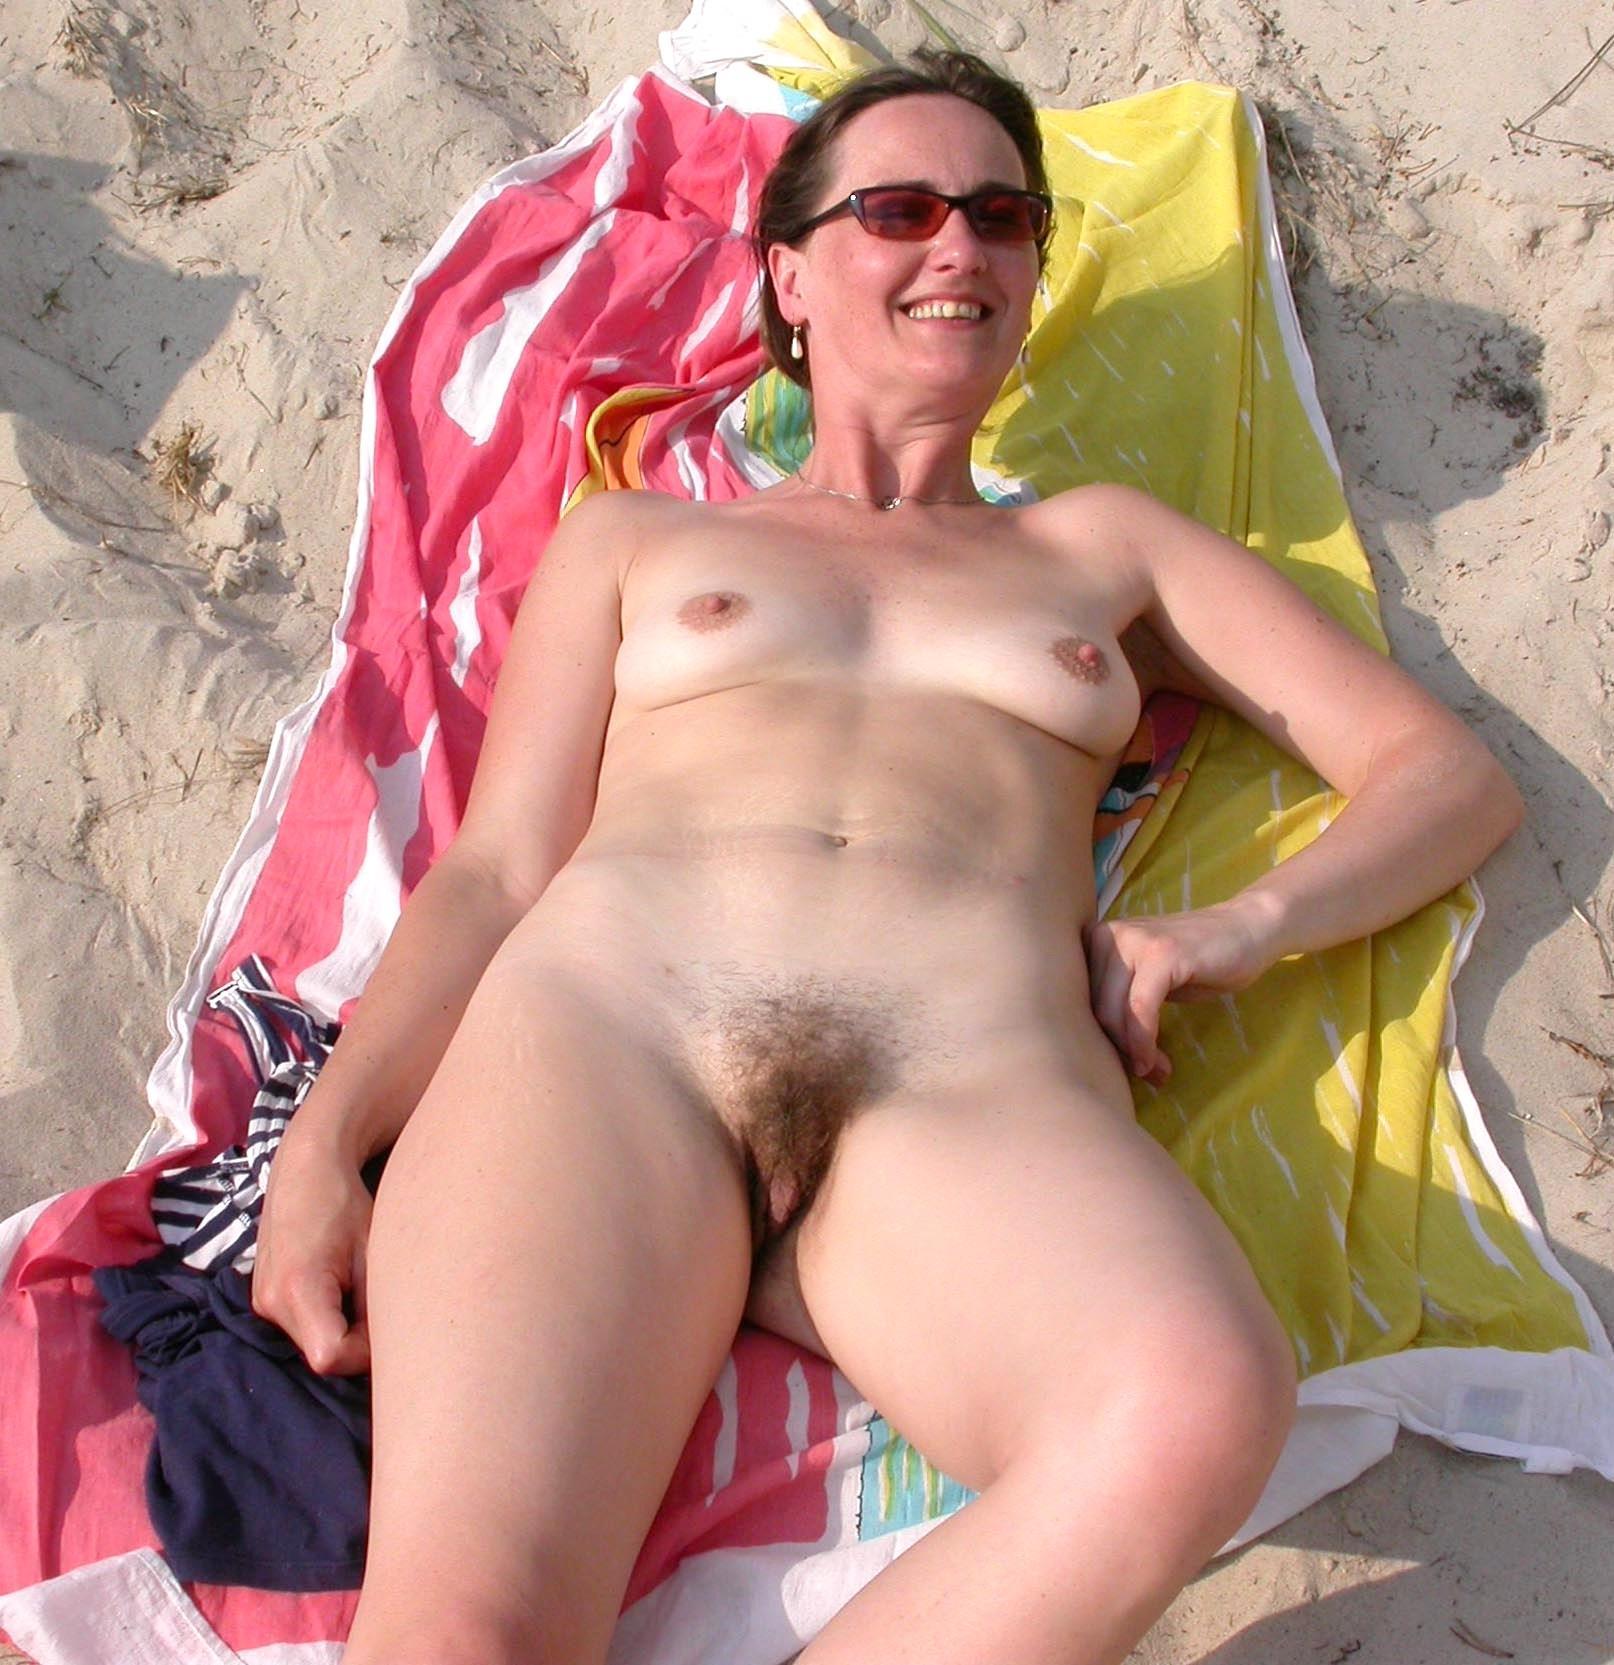 Gallery free porno nude woman